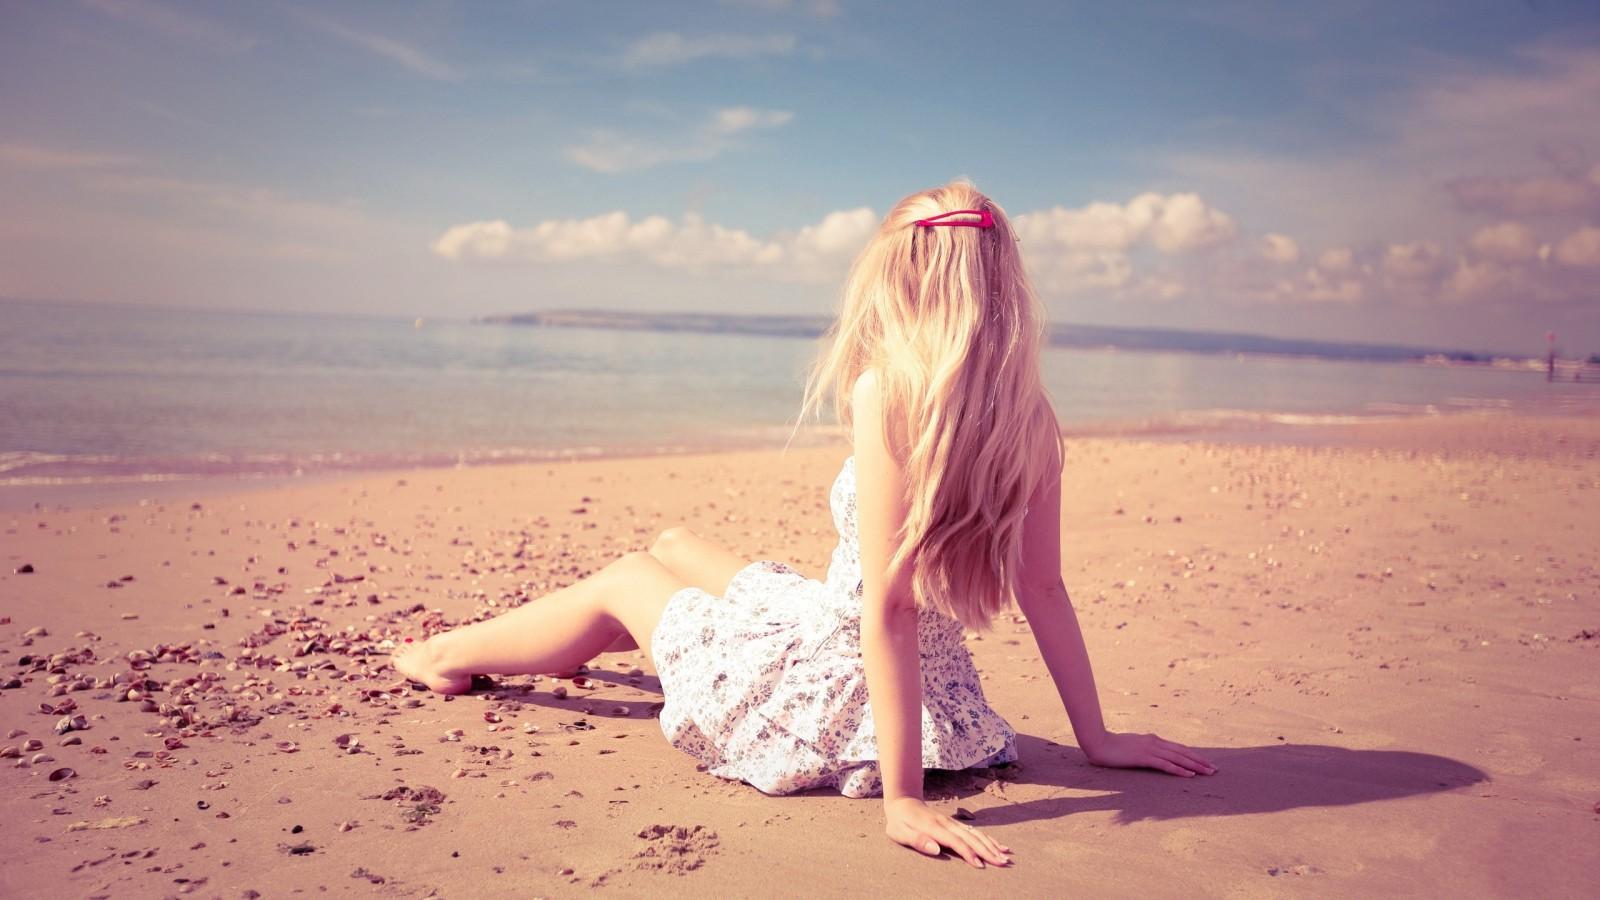 blonde_girl_on_the_beach-wallpaper-2560×1600